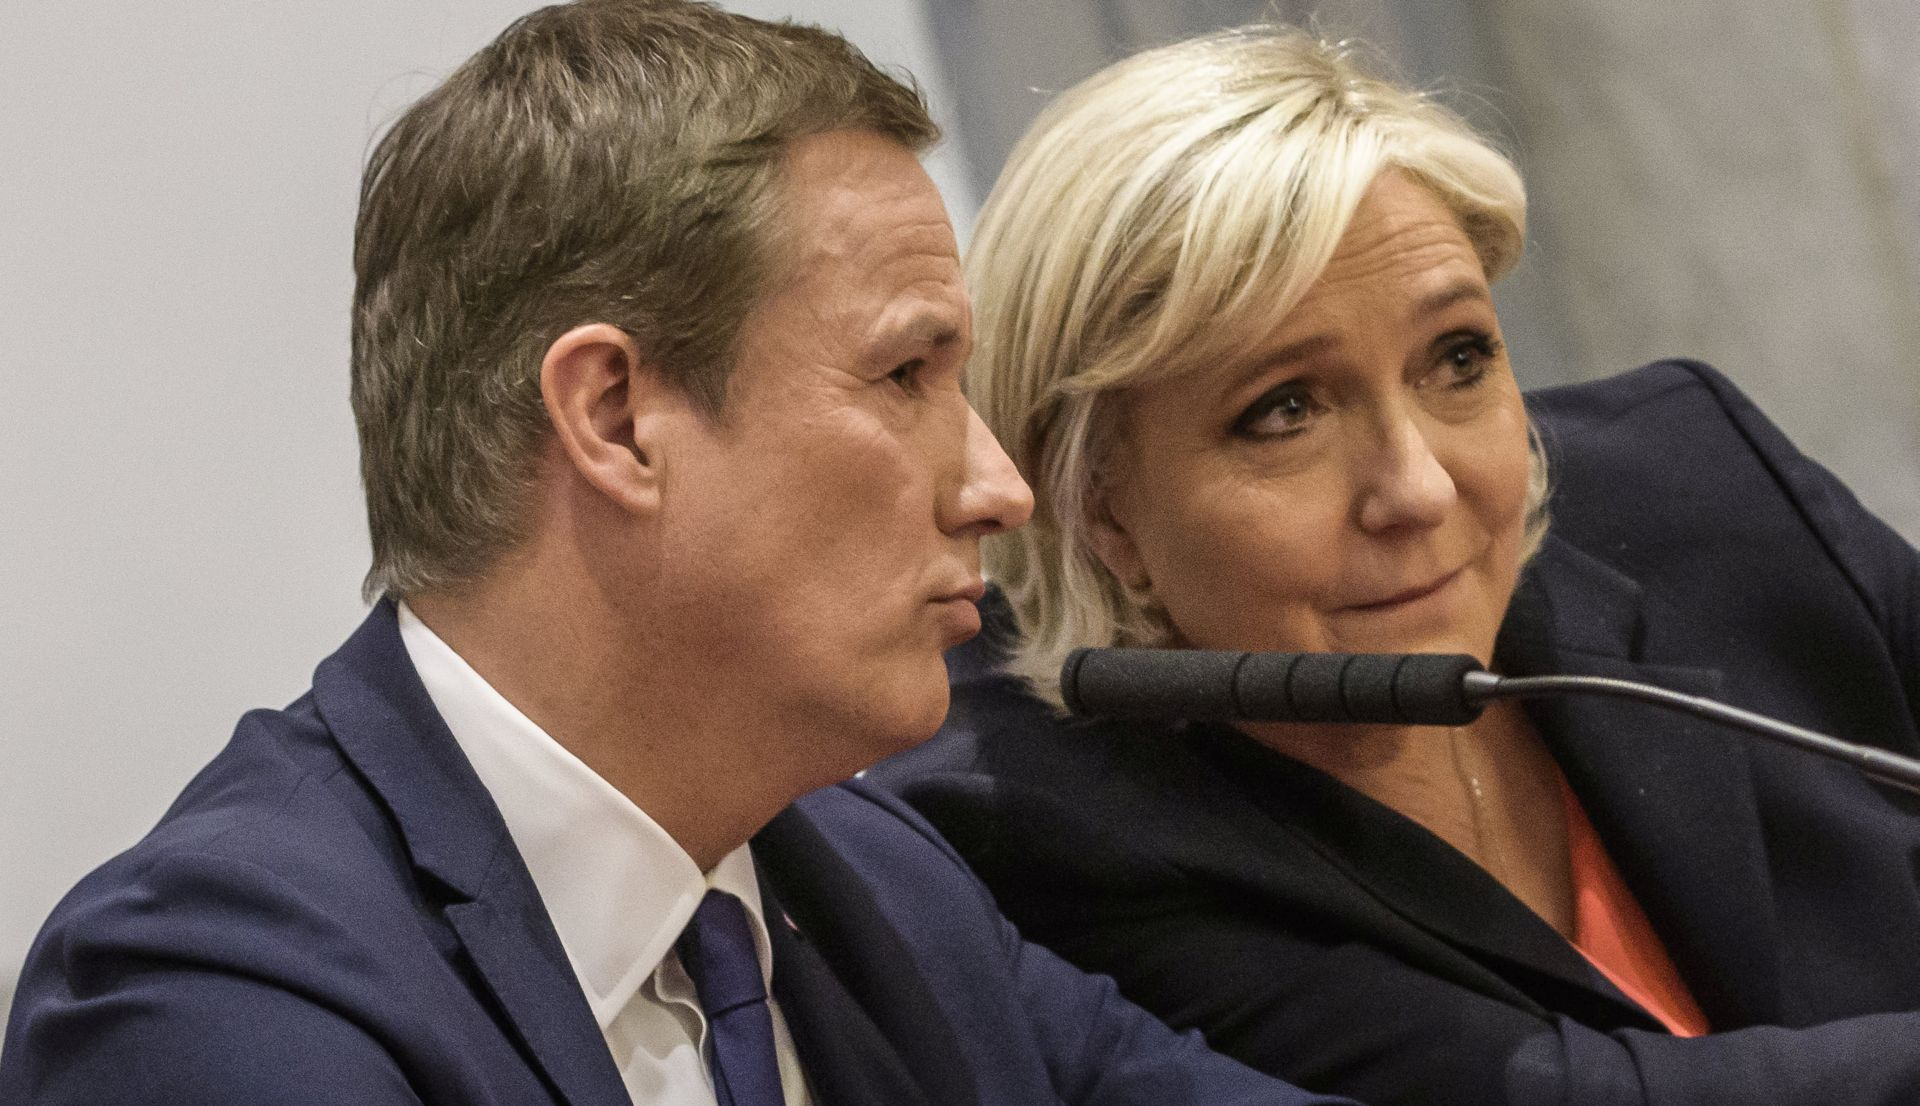 Le Pen bi za premijera nominirala čelnika DLF-a Dupont-Aignana